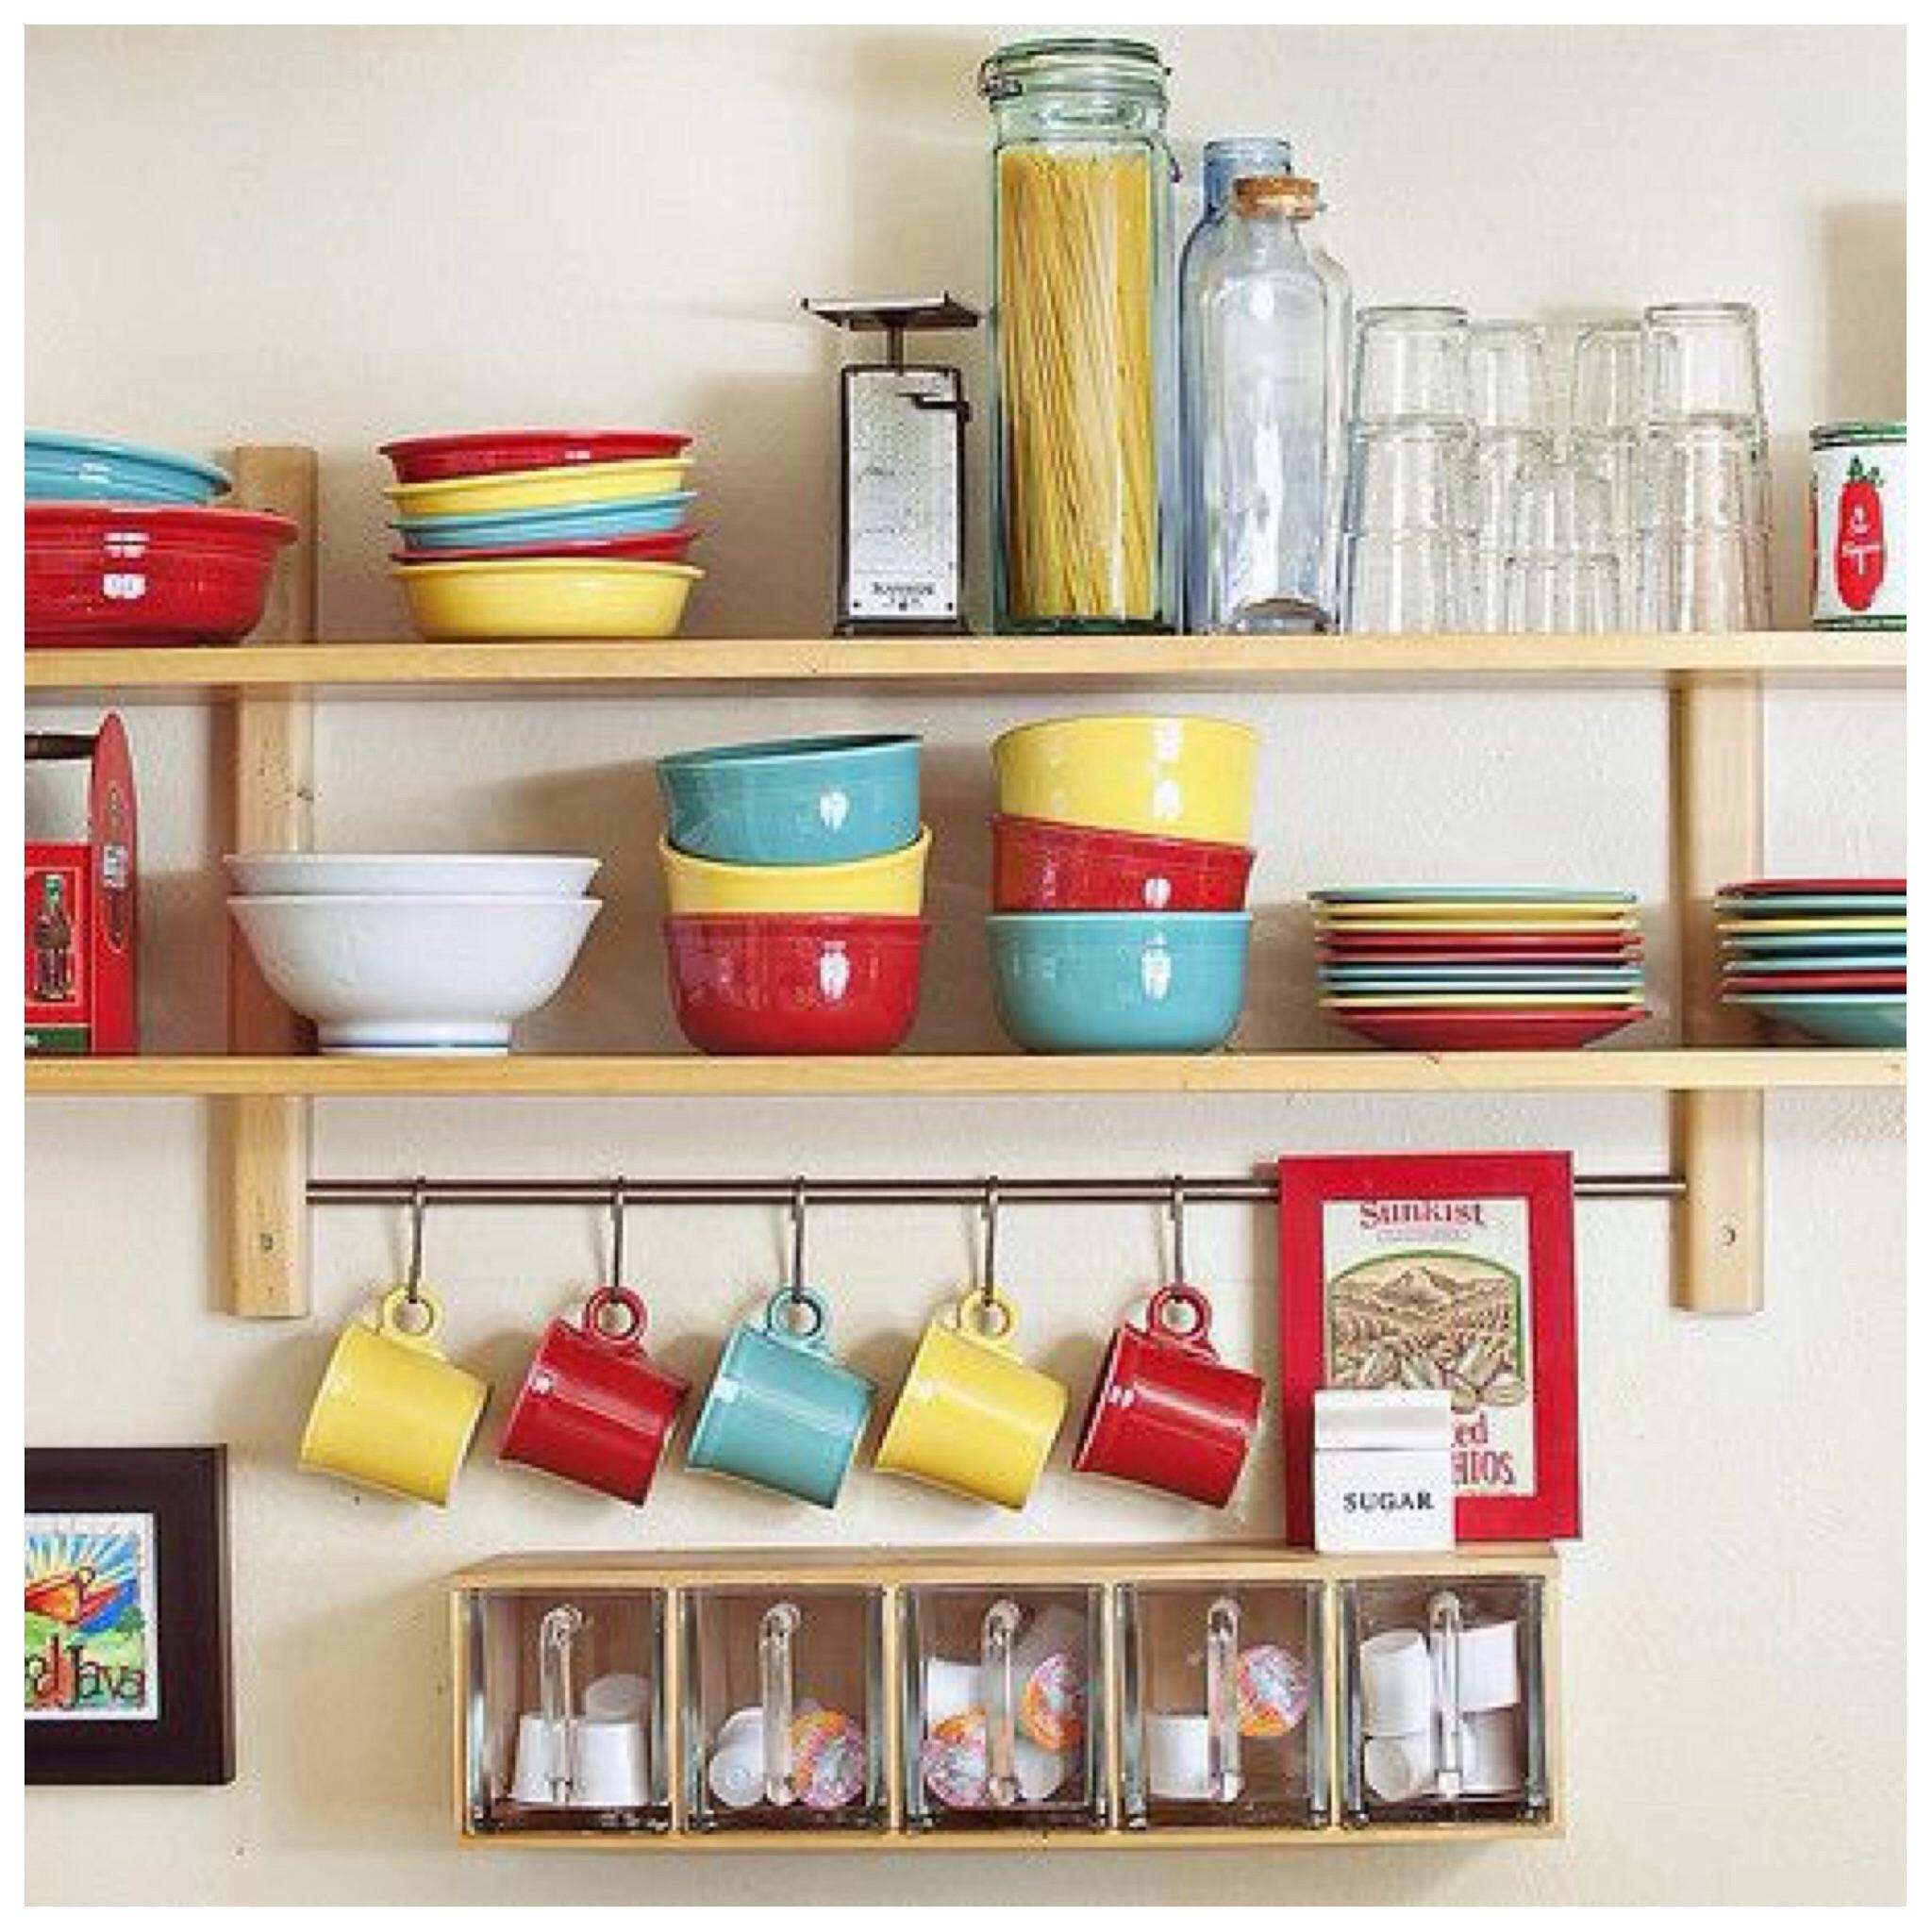 3 estilos para decorar estanter as de cocina for Como disenar una estanteria